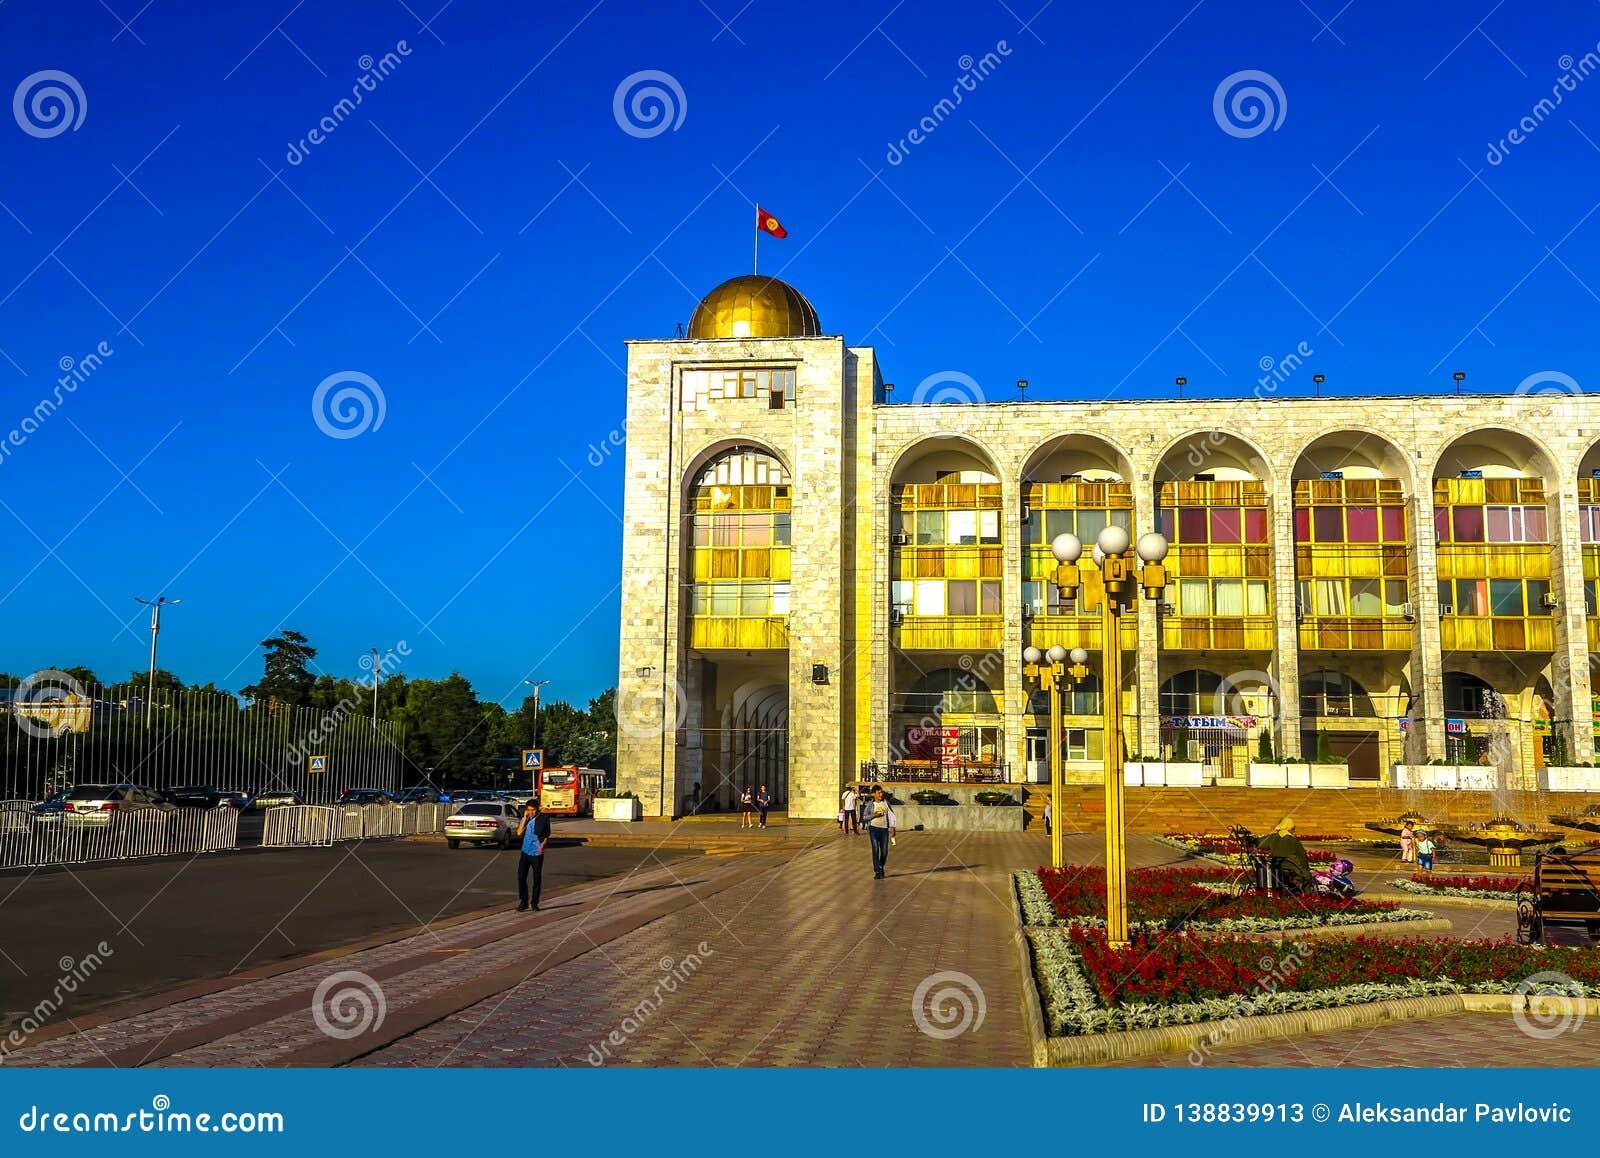 Bishkek Ala Too Square 04